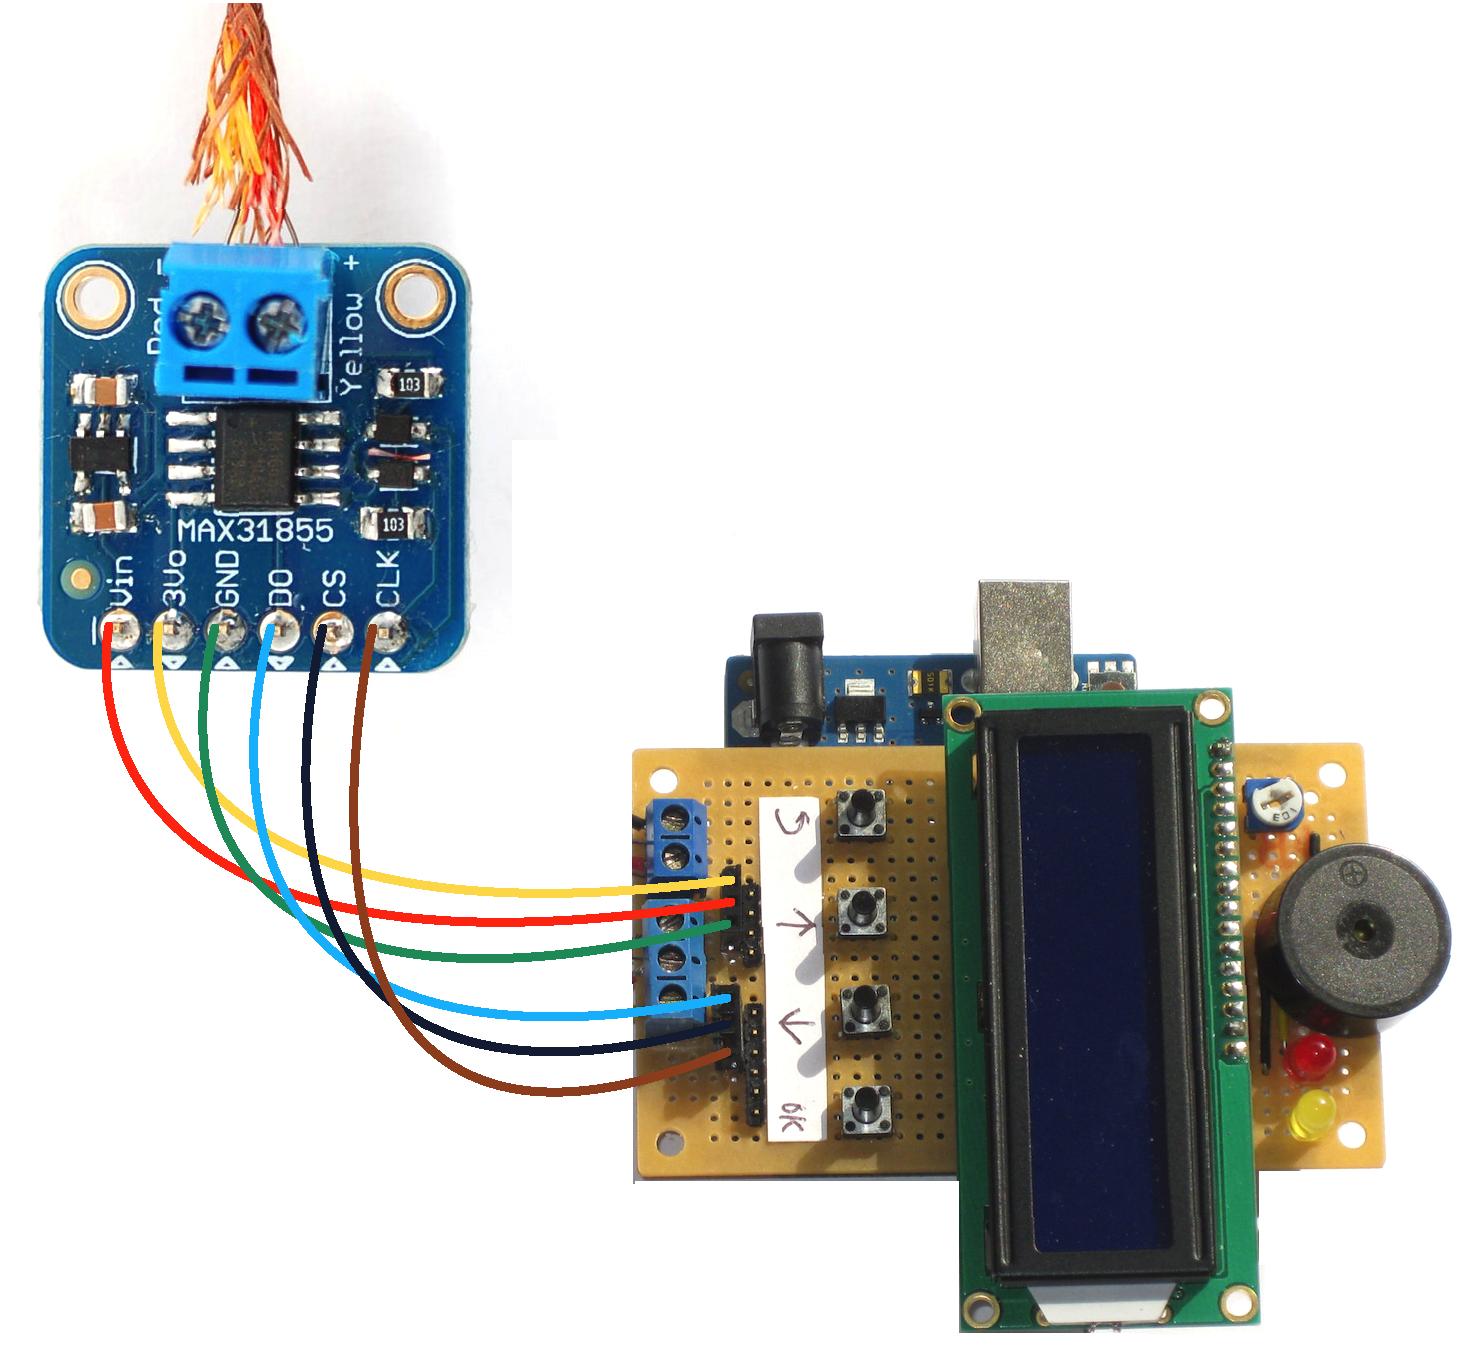 Magic Smoke: Stripboard PID Arduino Shield, Part 4